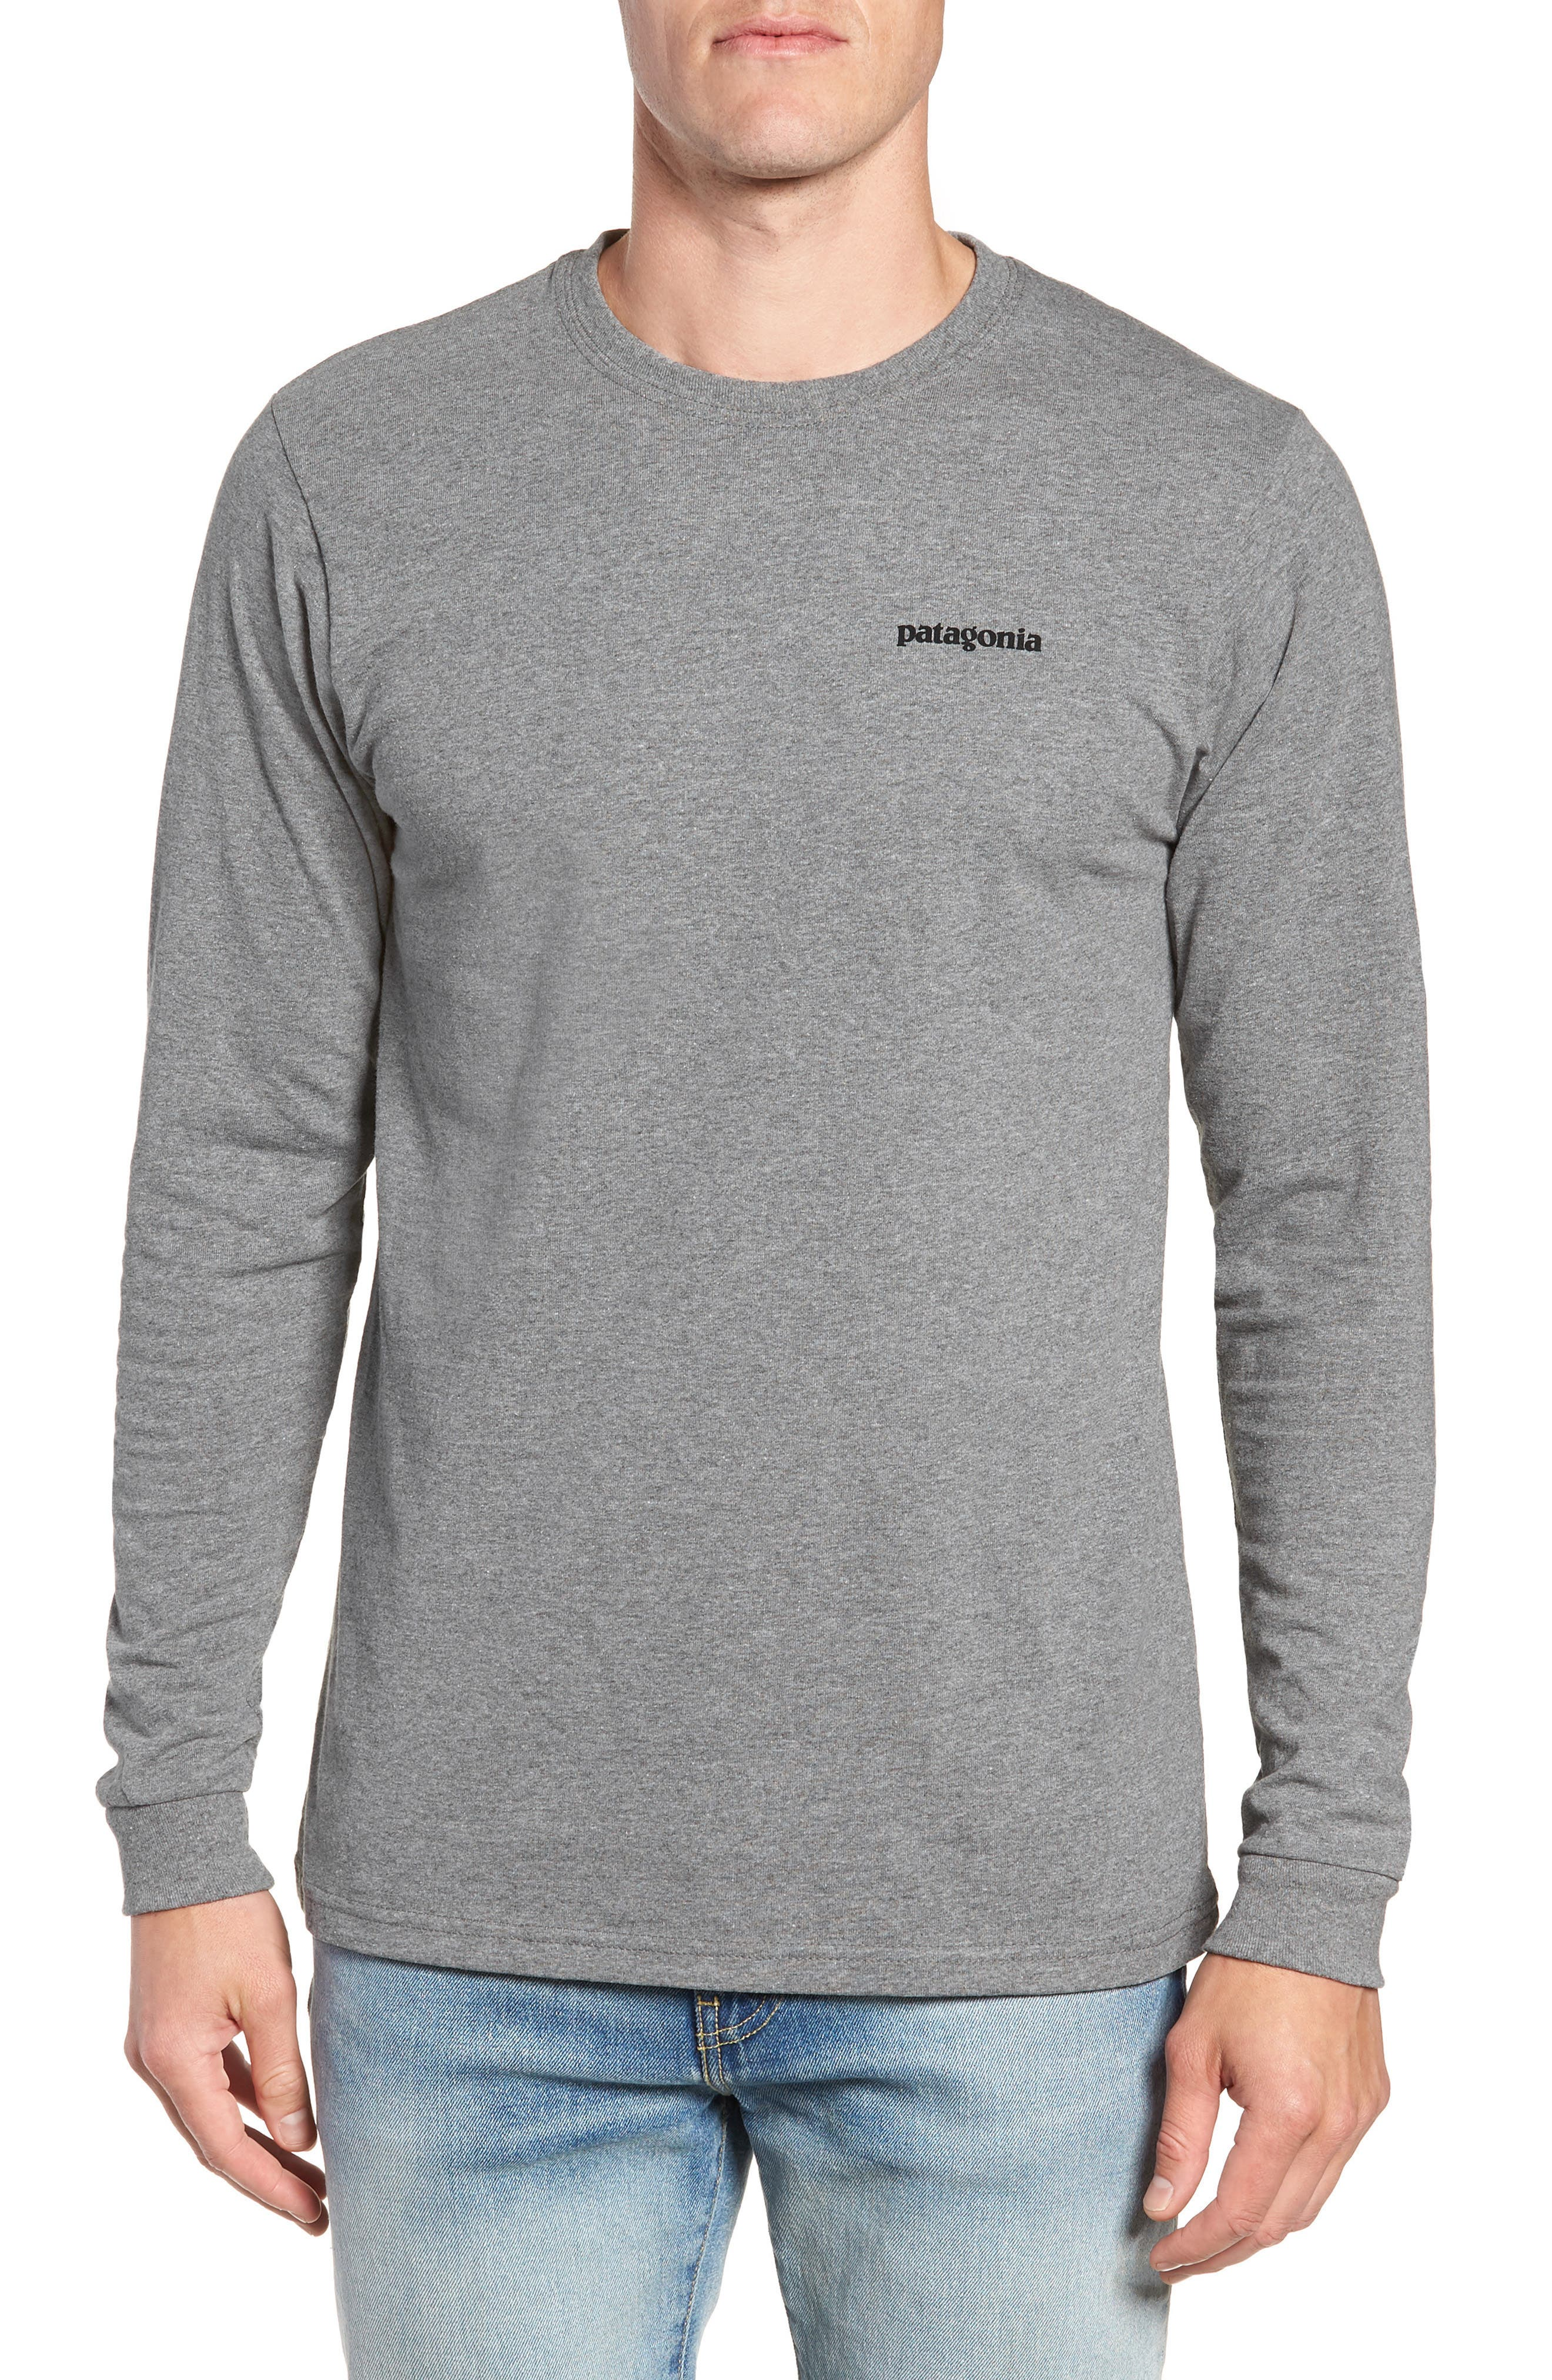 PATAGONIA Fitz Roy Responsibili-Tee Long-Sleeve T-Shirt, Main, color, 020